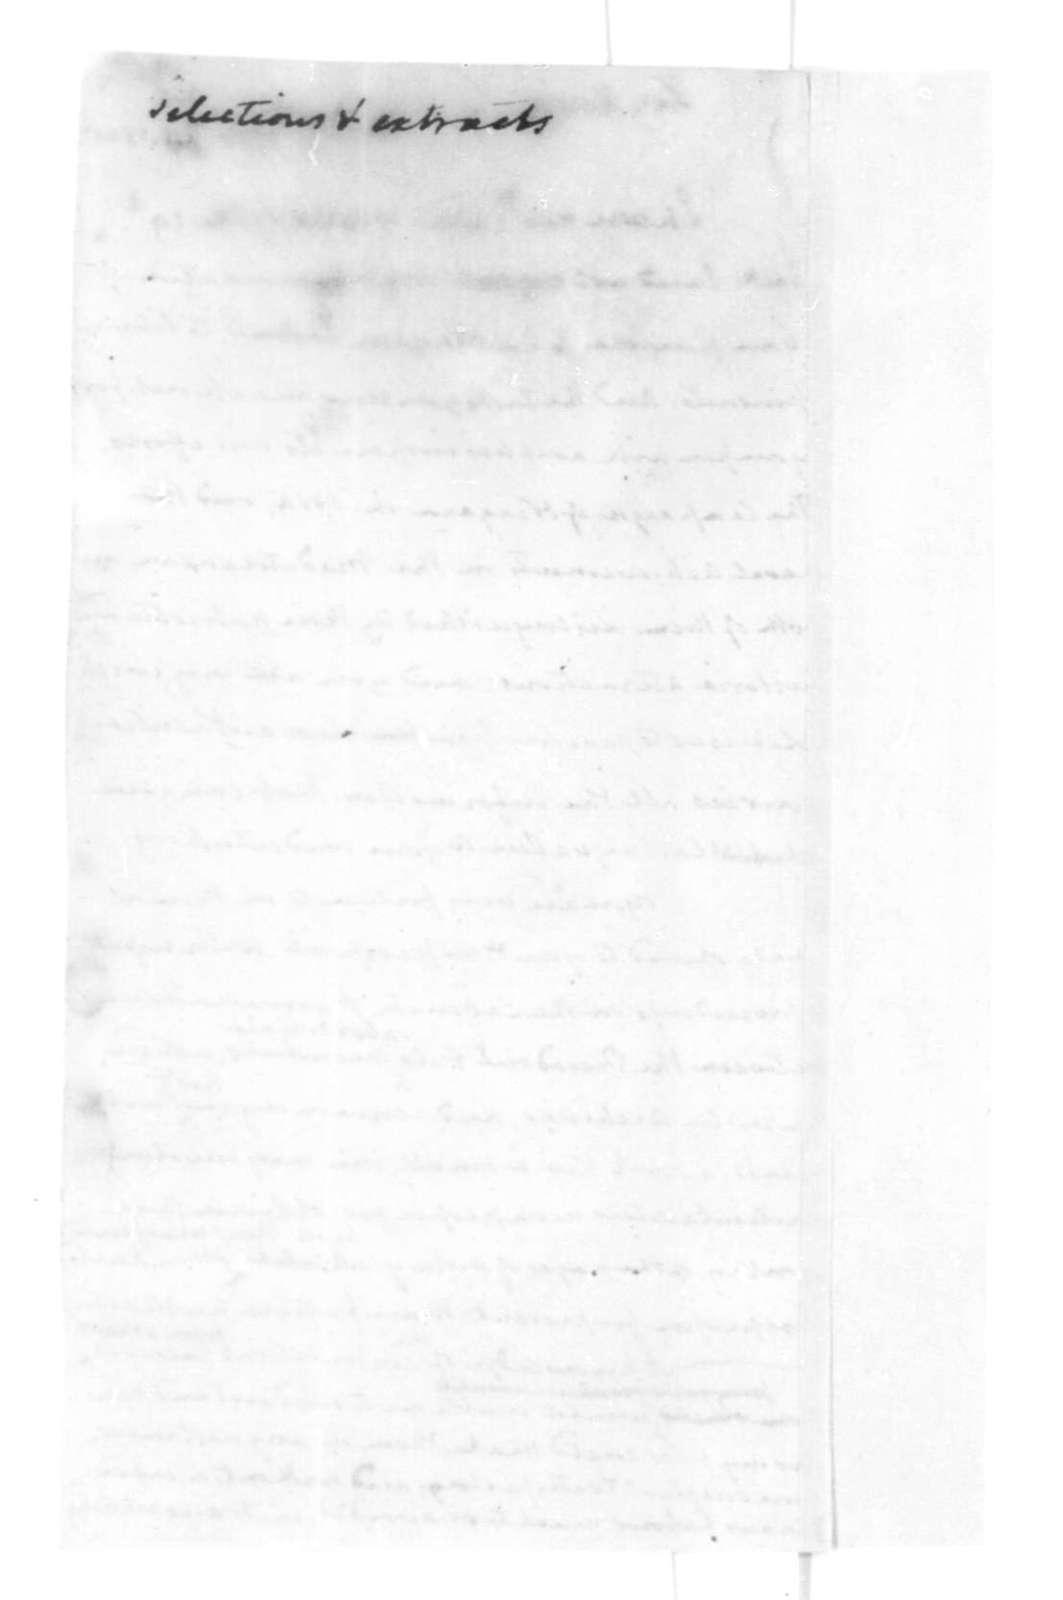 James Madison to Henry Lee, November 29, 1825.